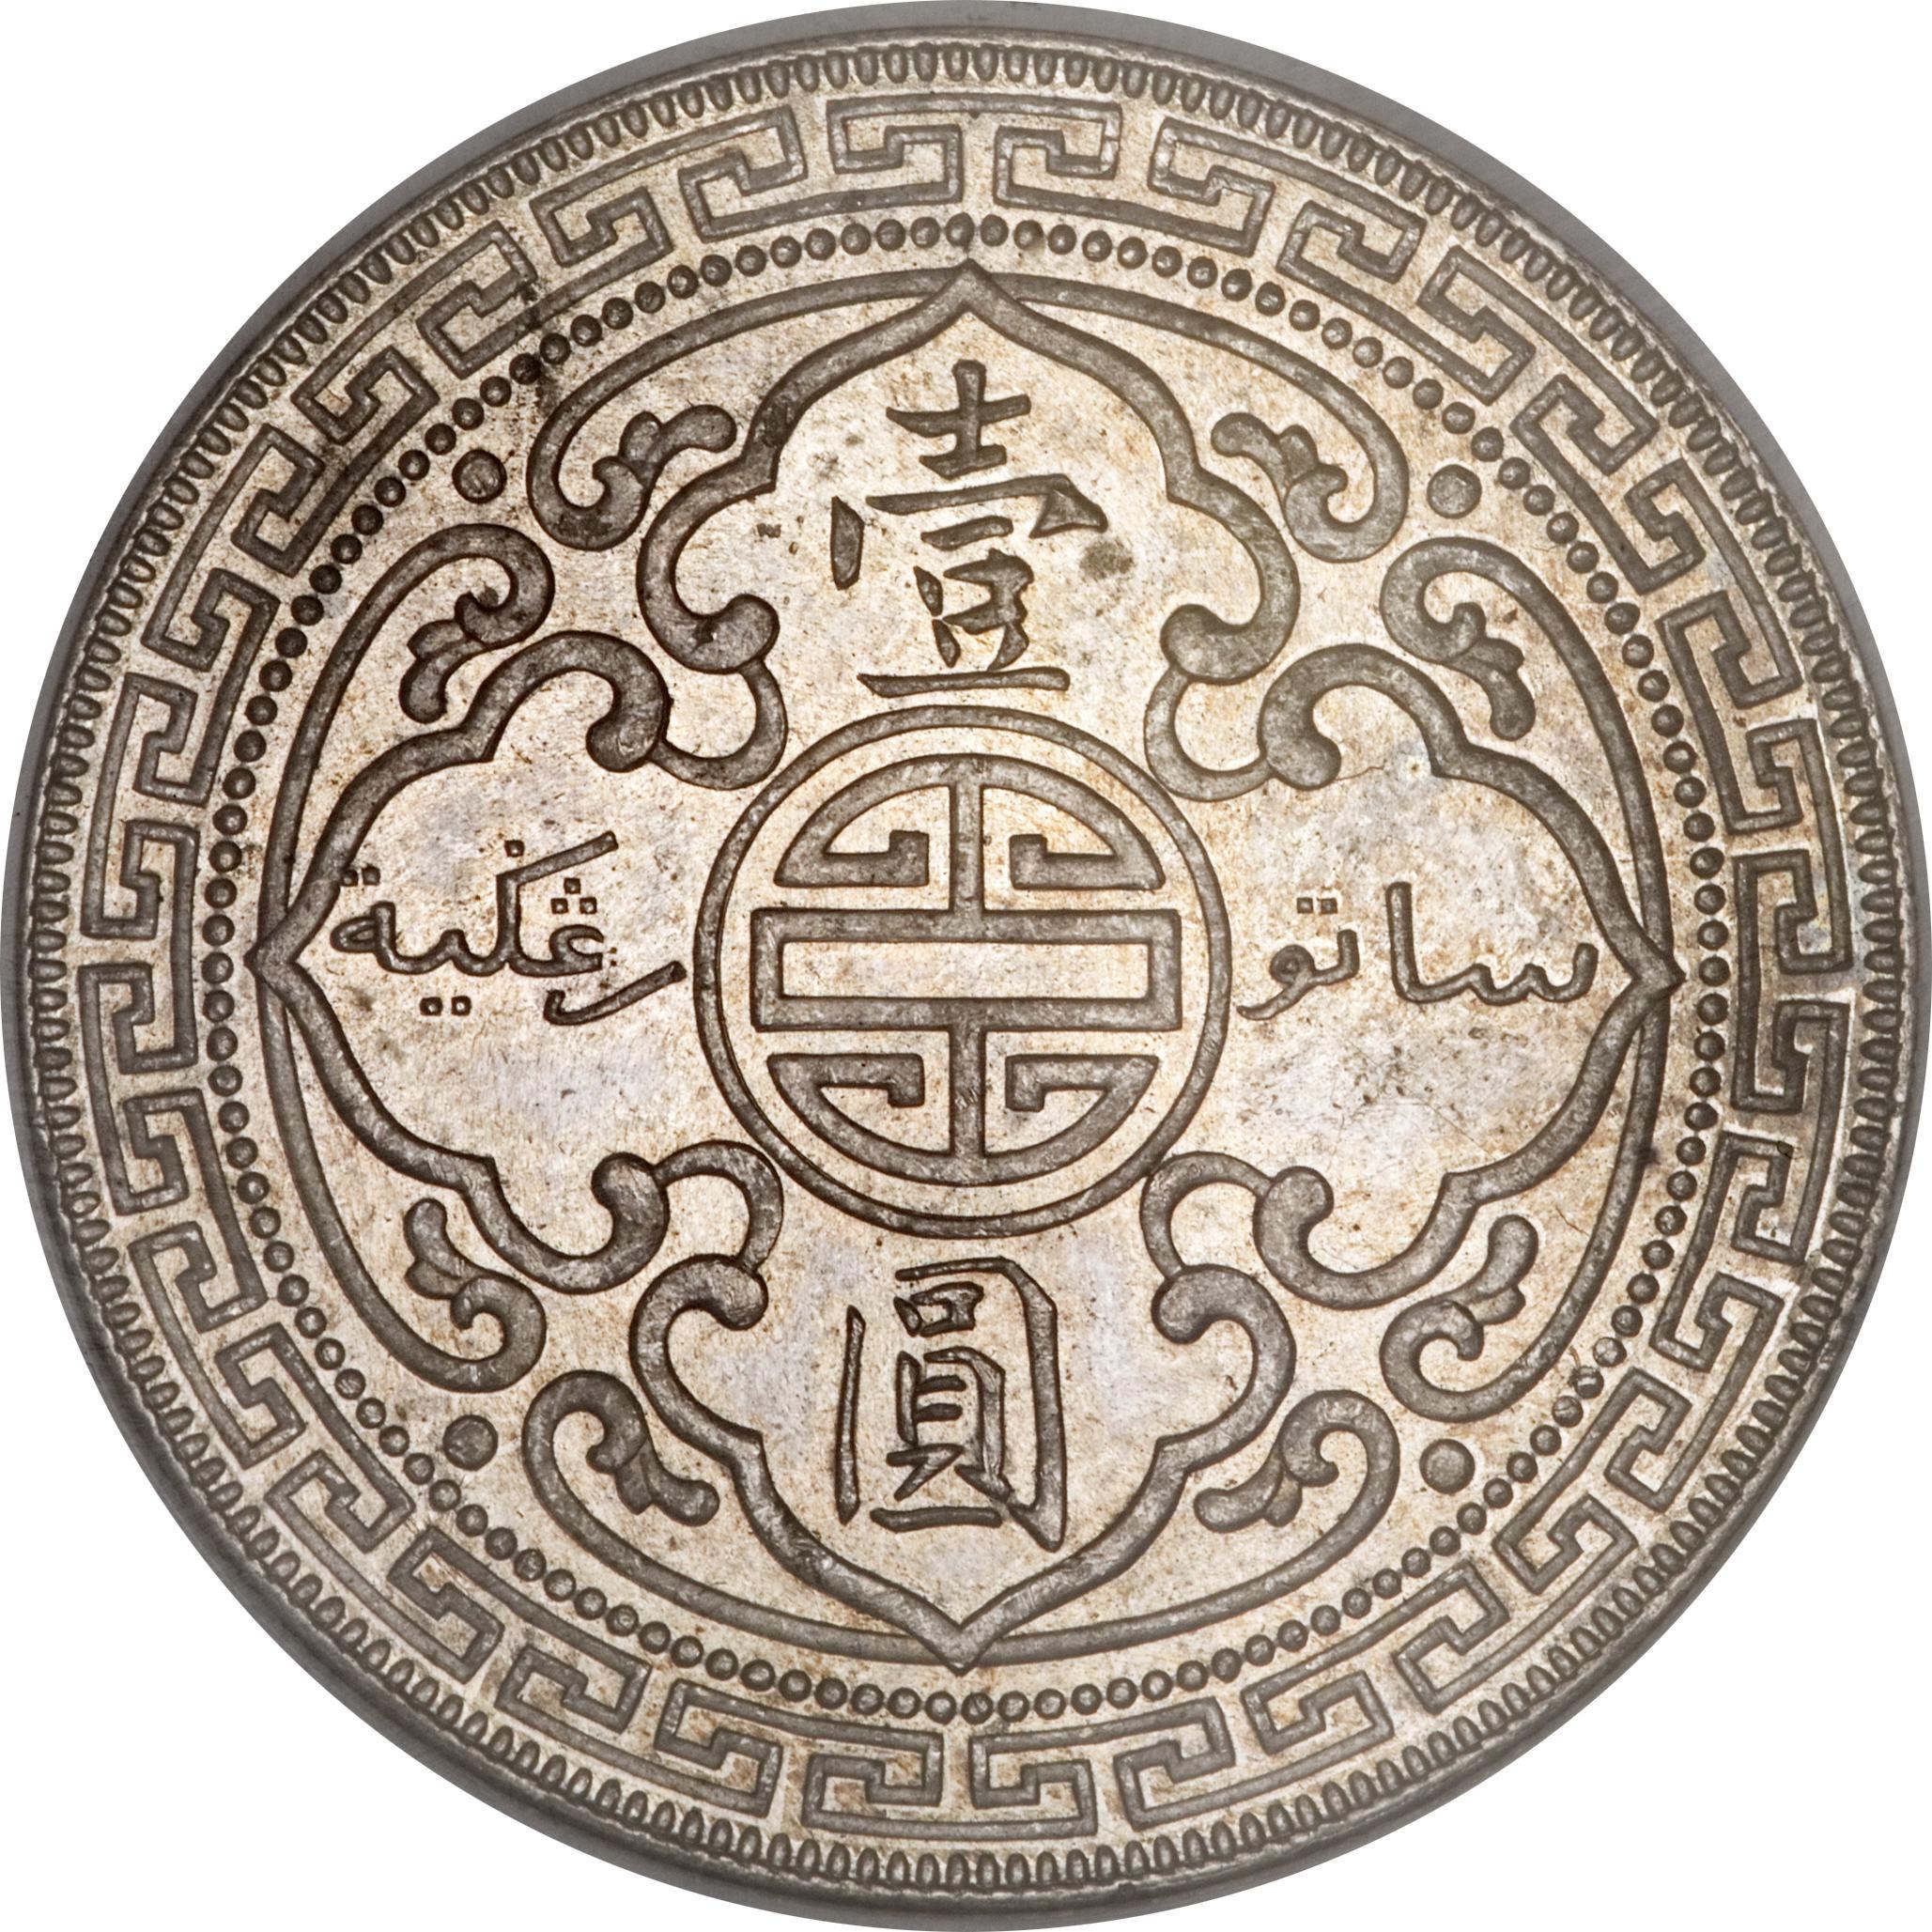 1 Dollar Trade Coinage United Kingdom Numista